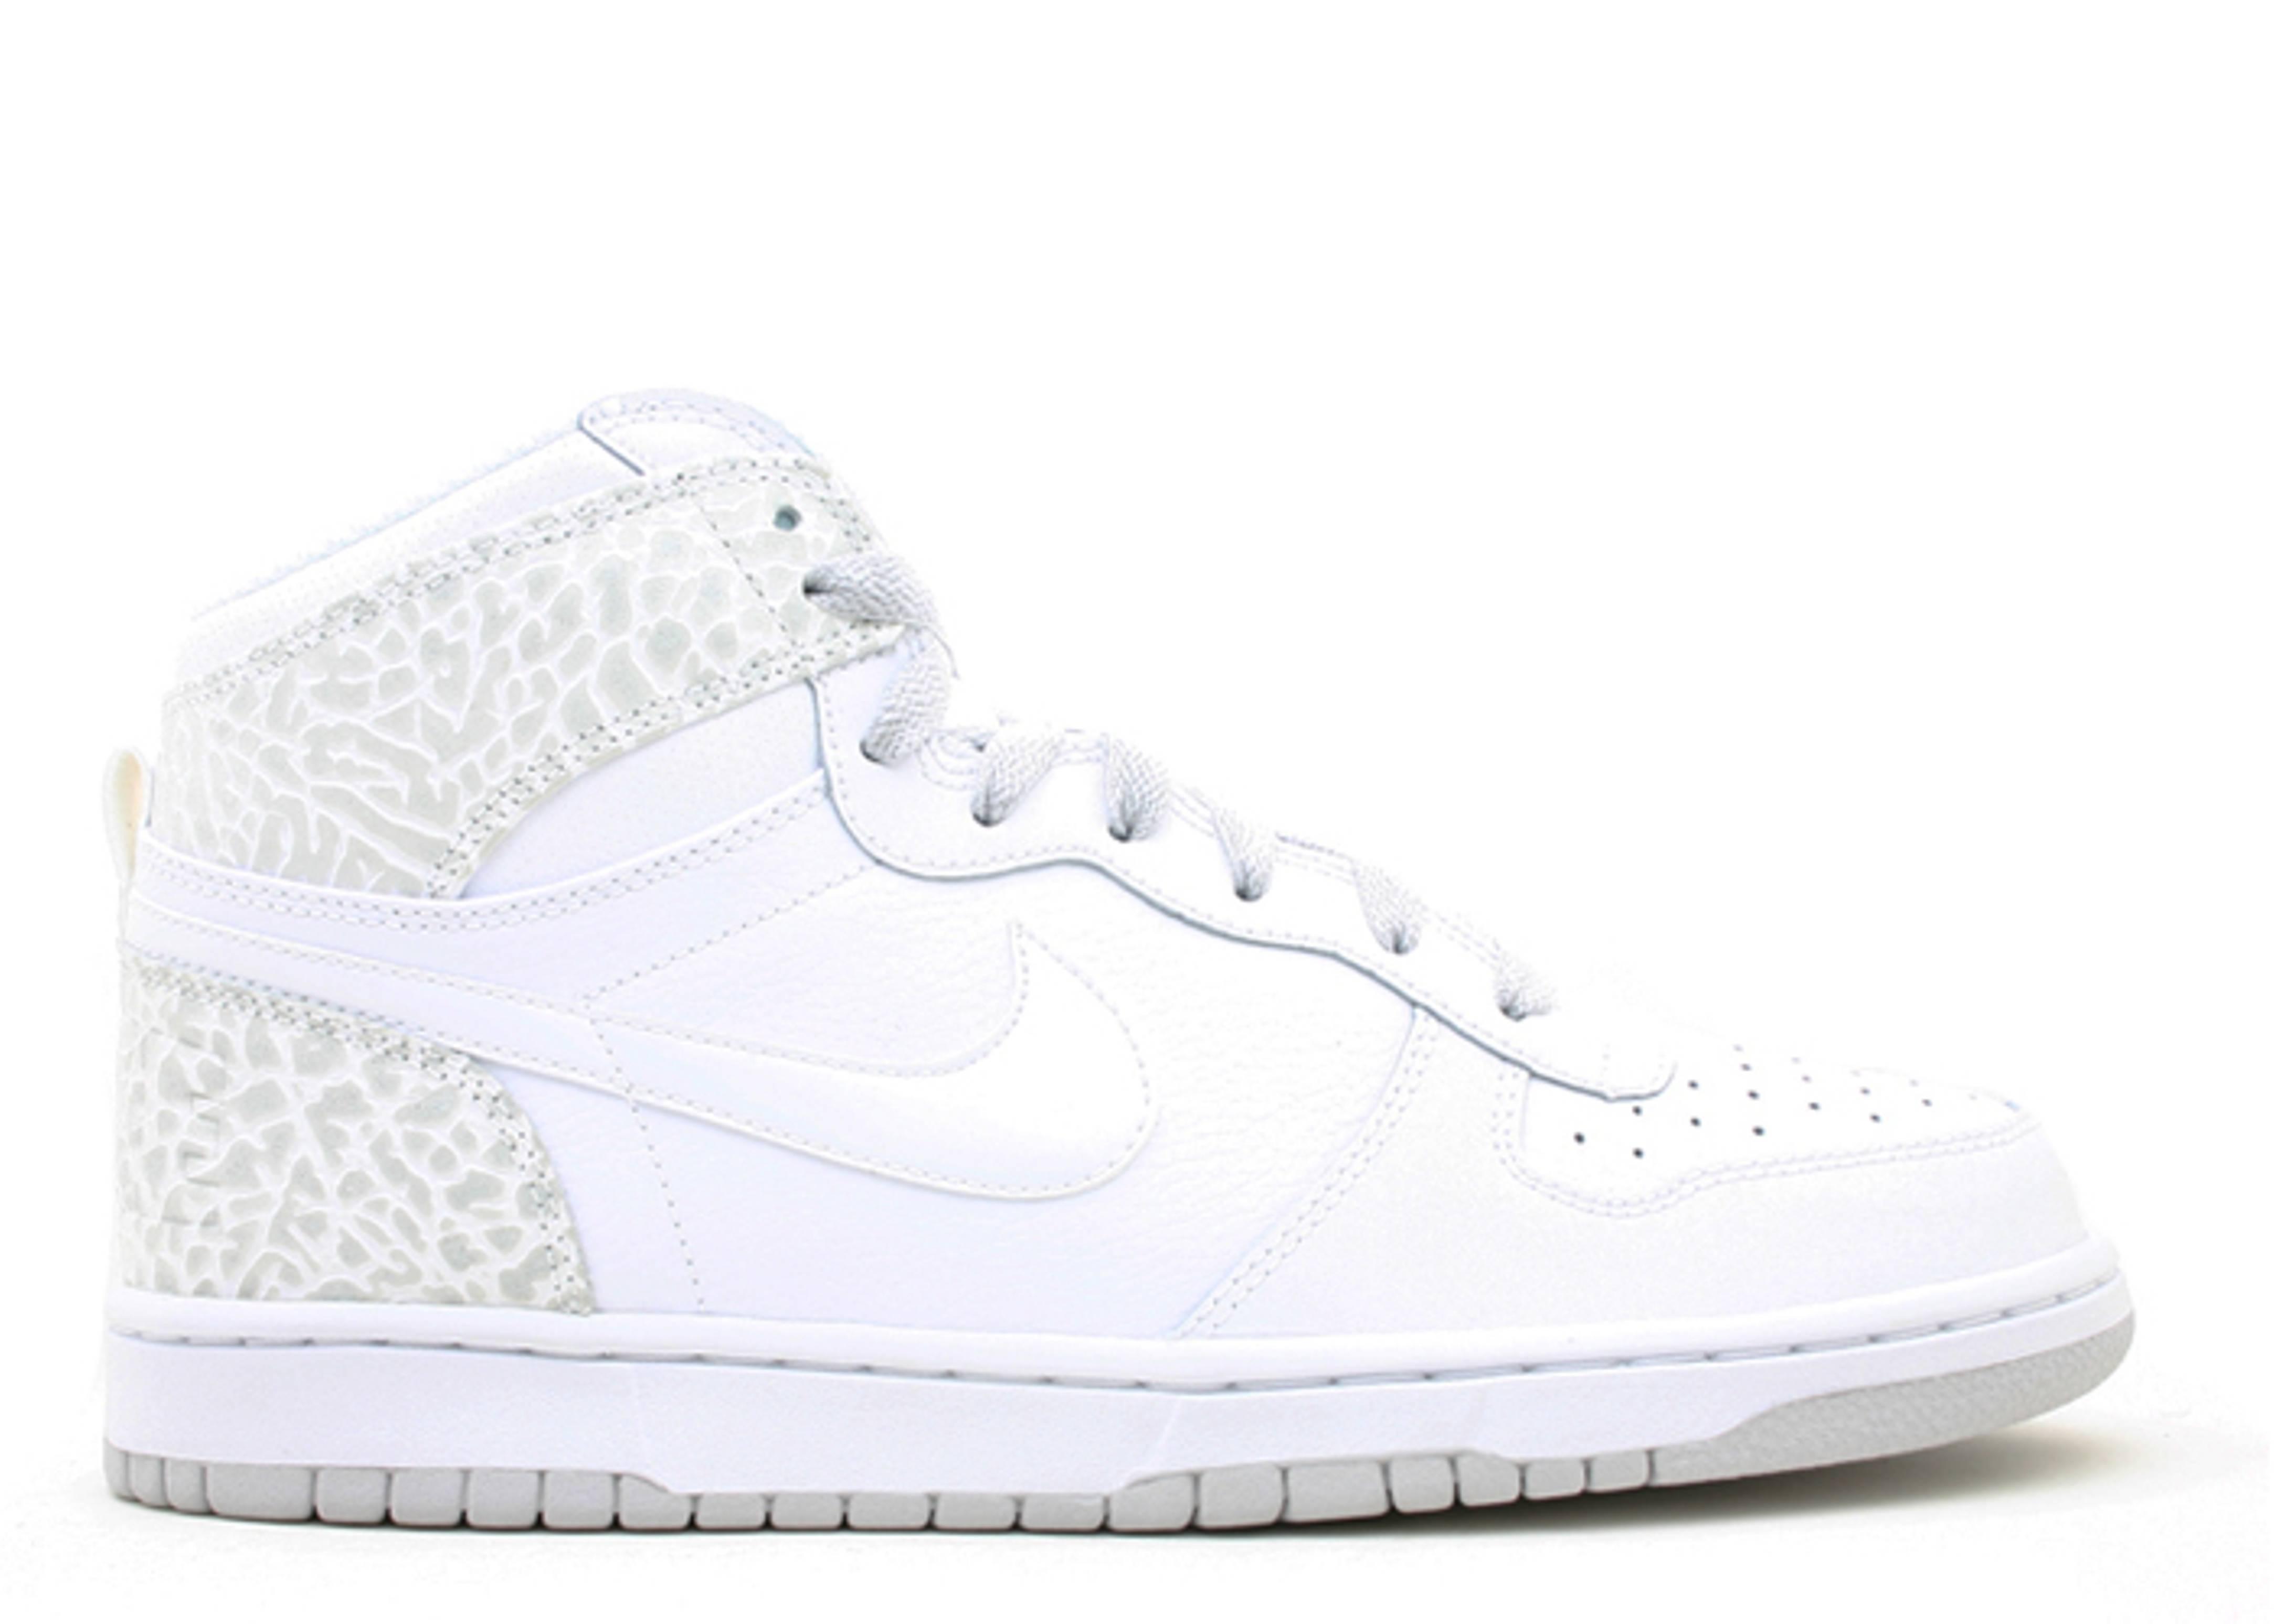 official photos bbb3b d38fc Big Nike High - Nike - 336608 111 - white white neutral grey ...